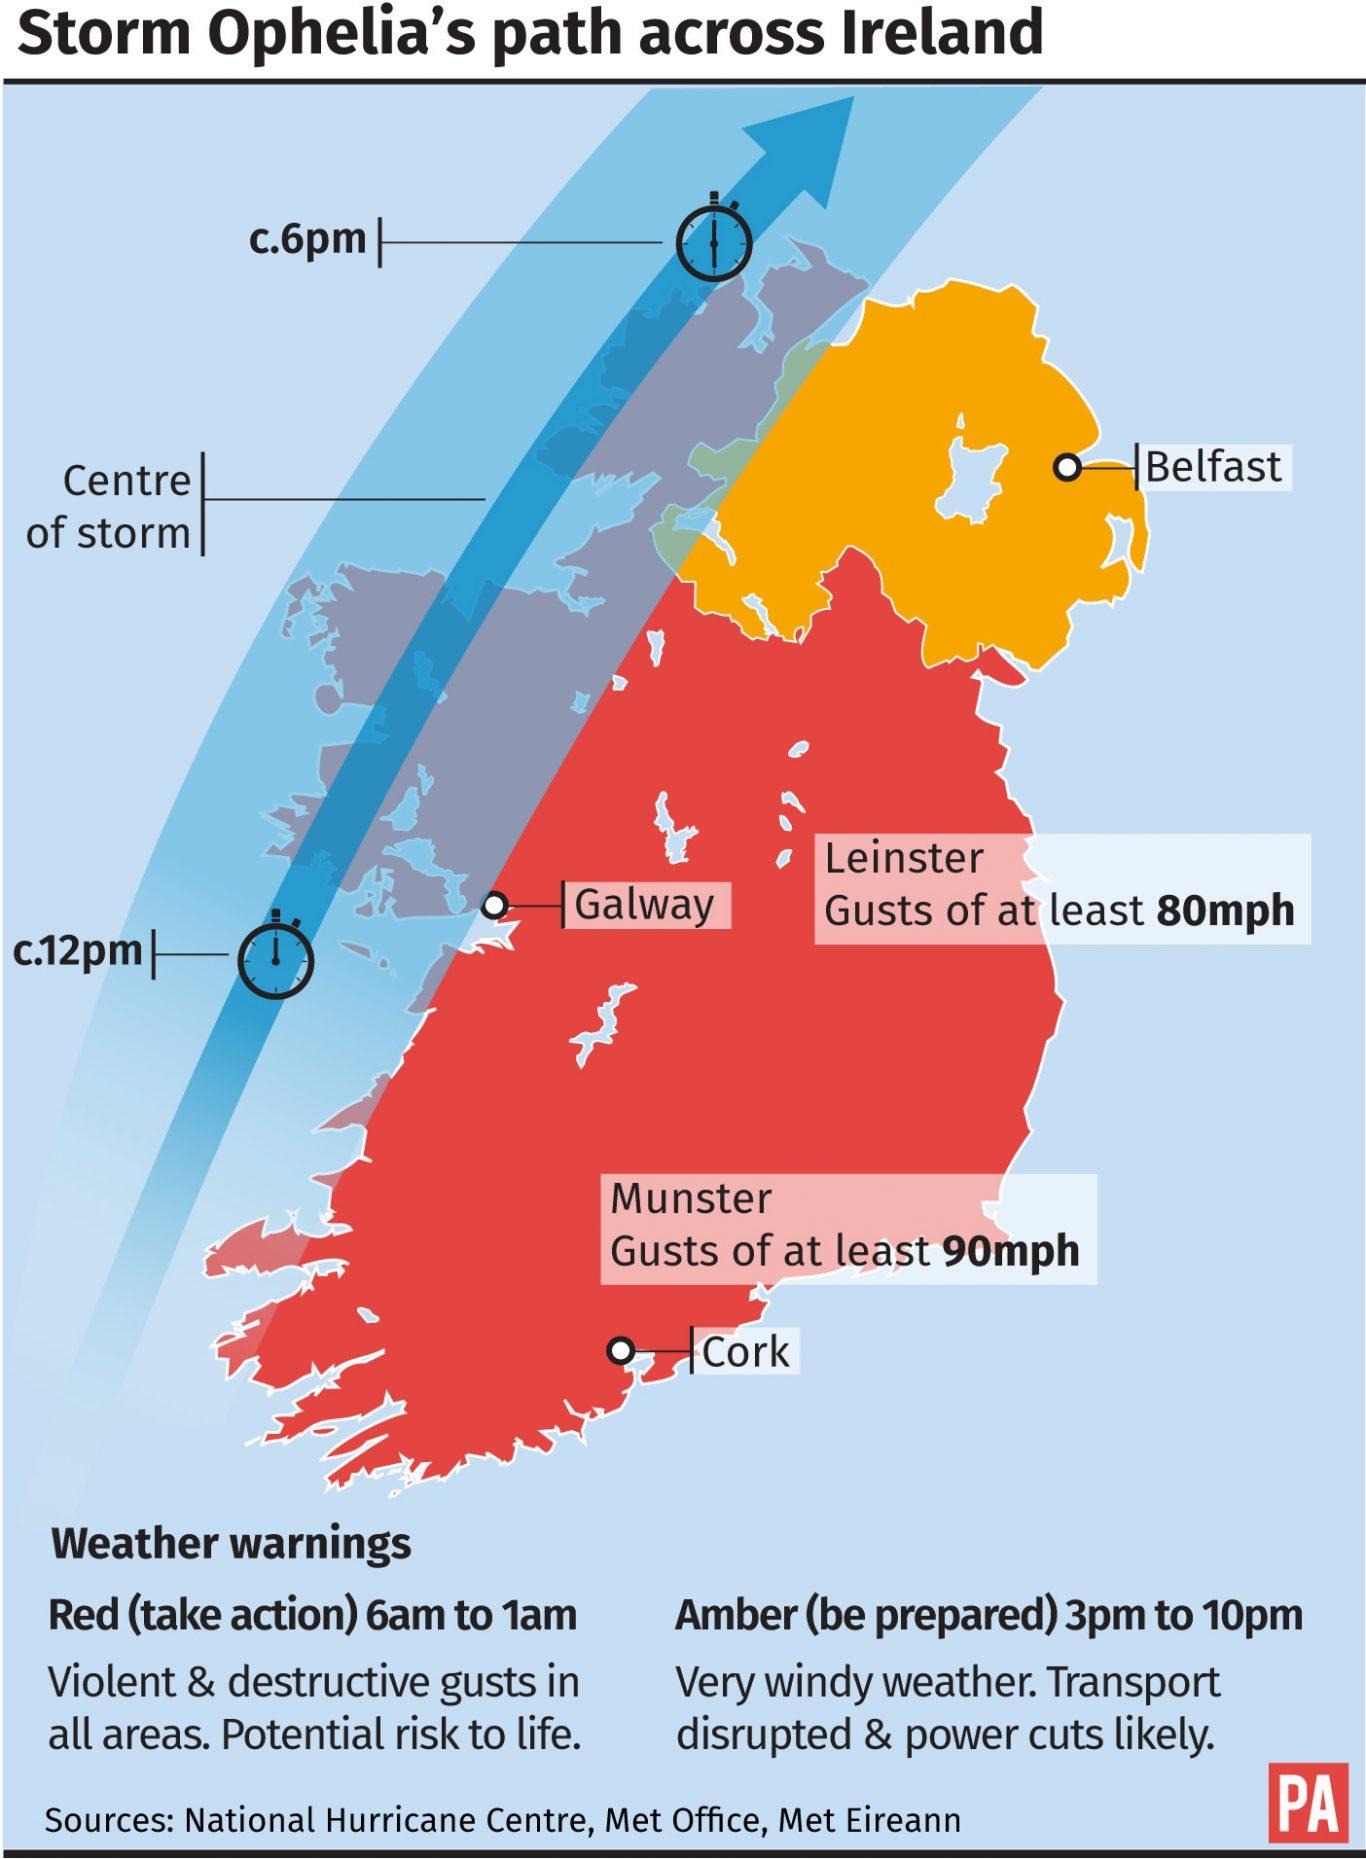 Storm Ophelia's path across Ireland